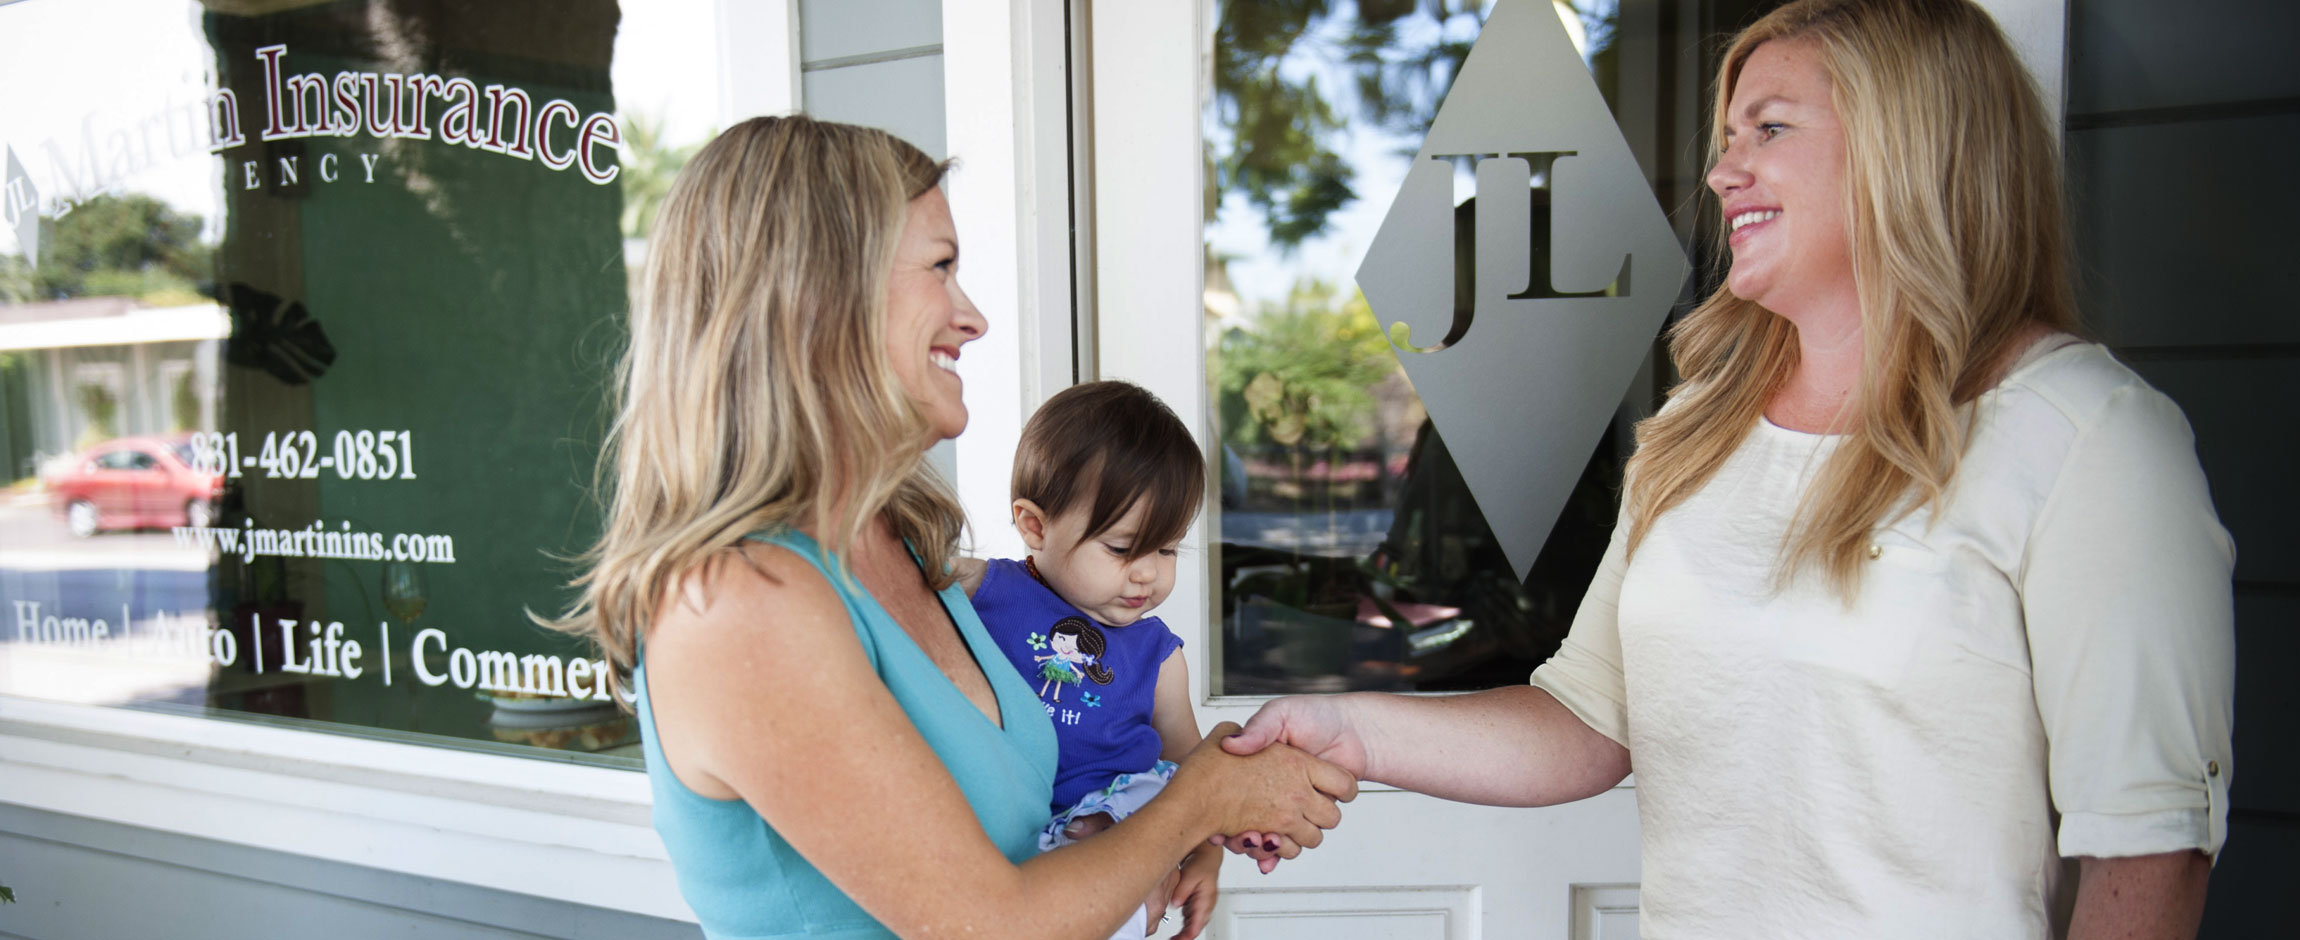 JL Martin Insurance Agency - Life Insurance